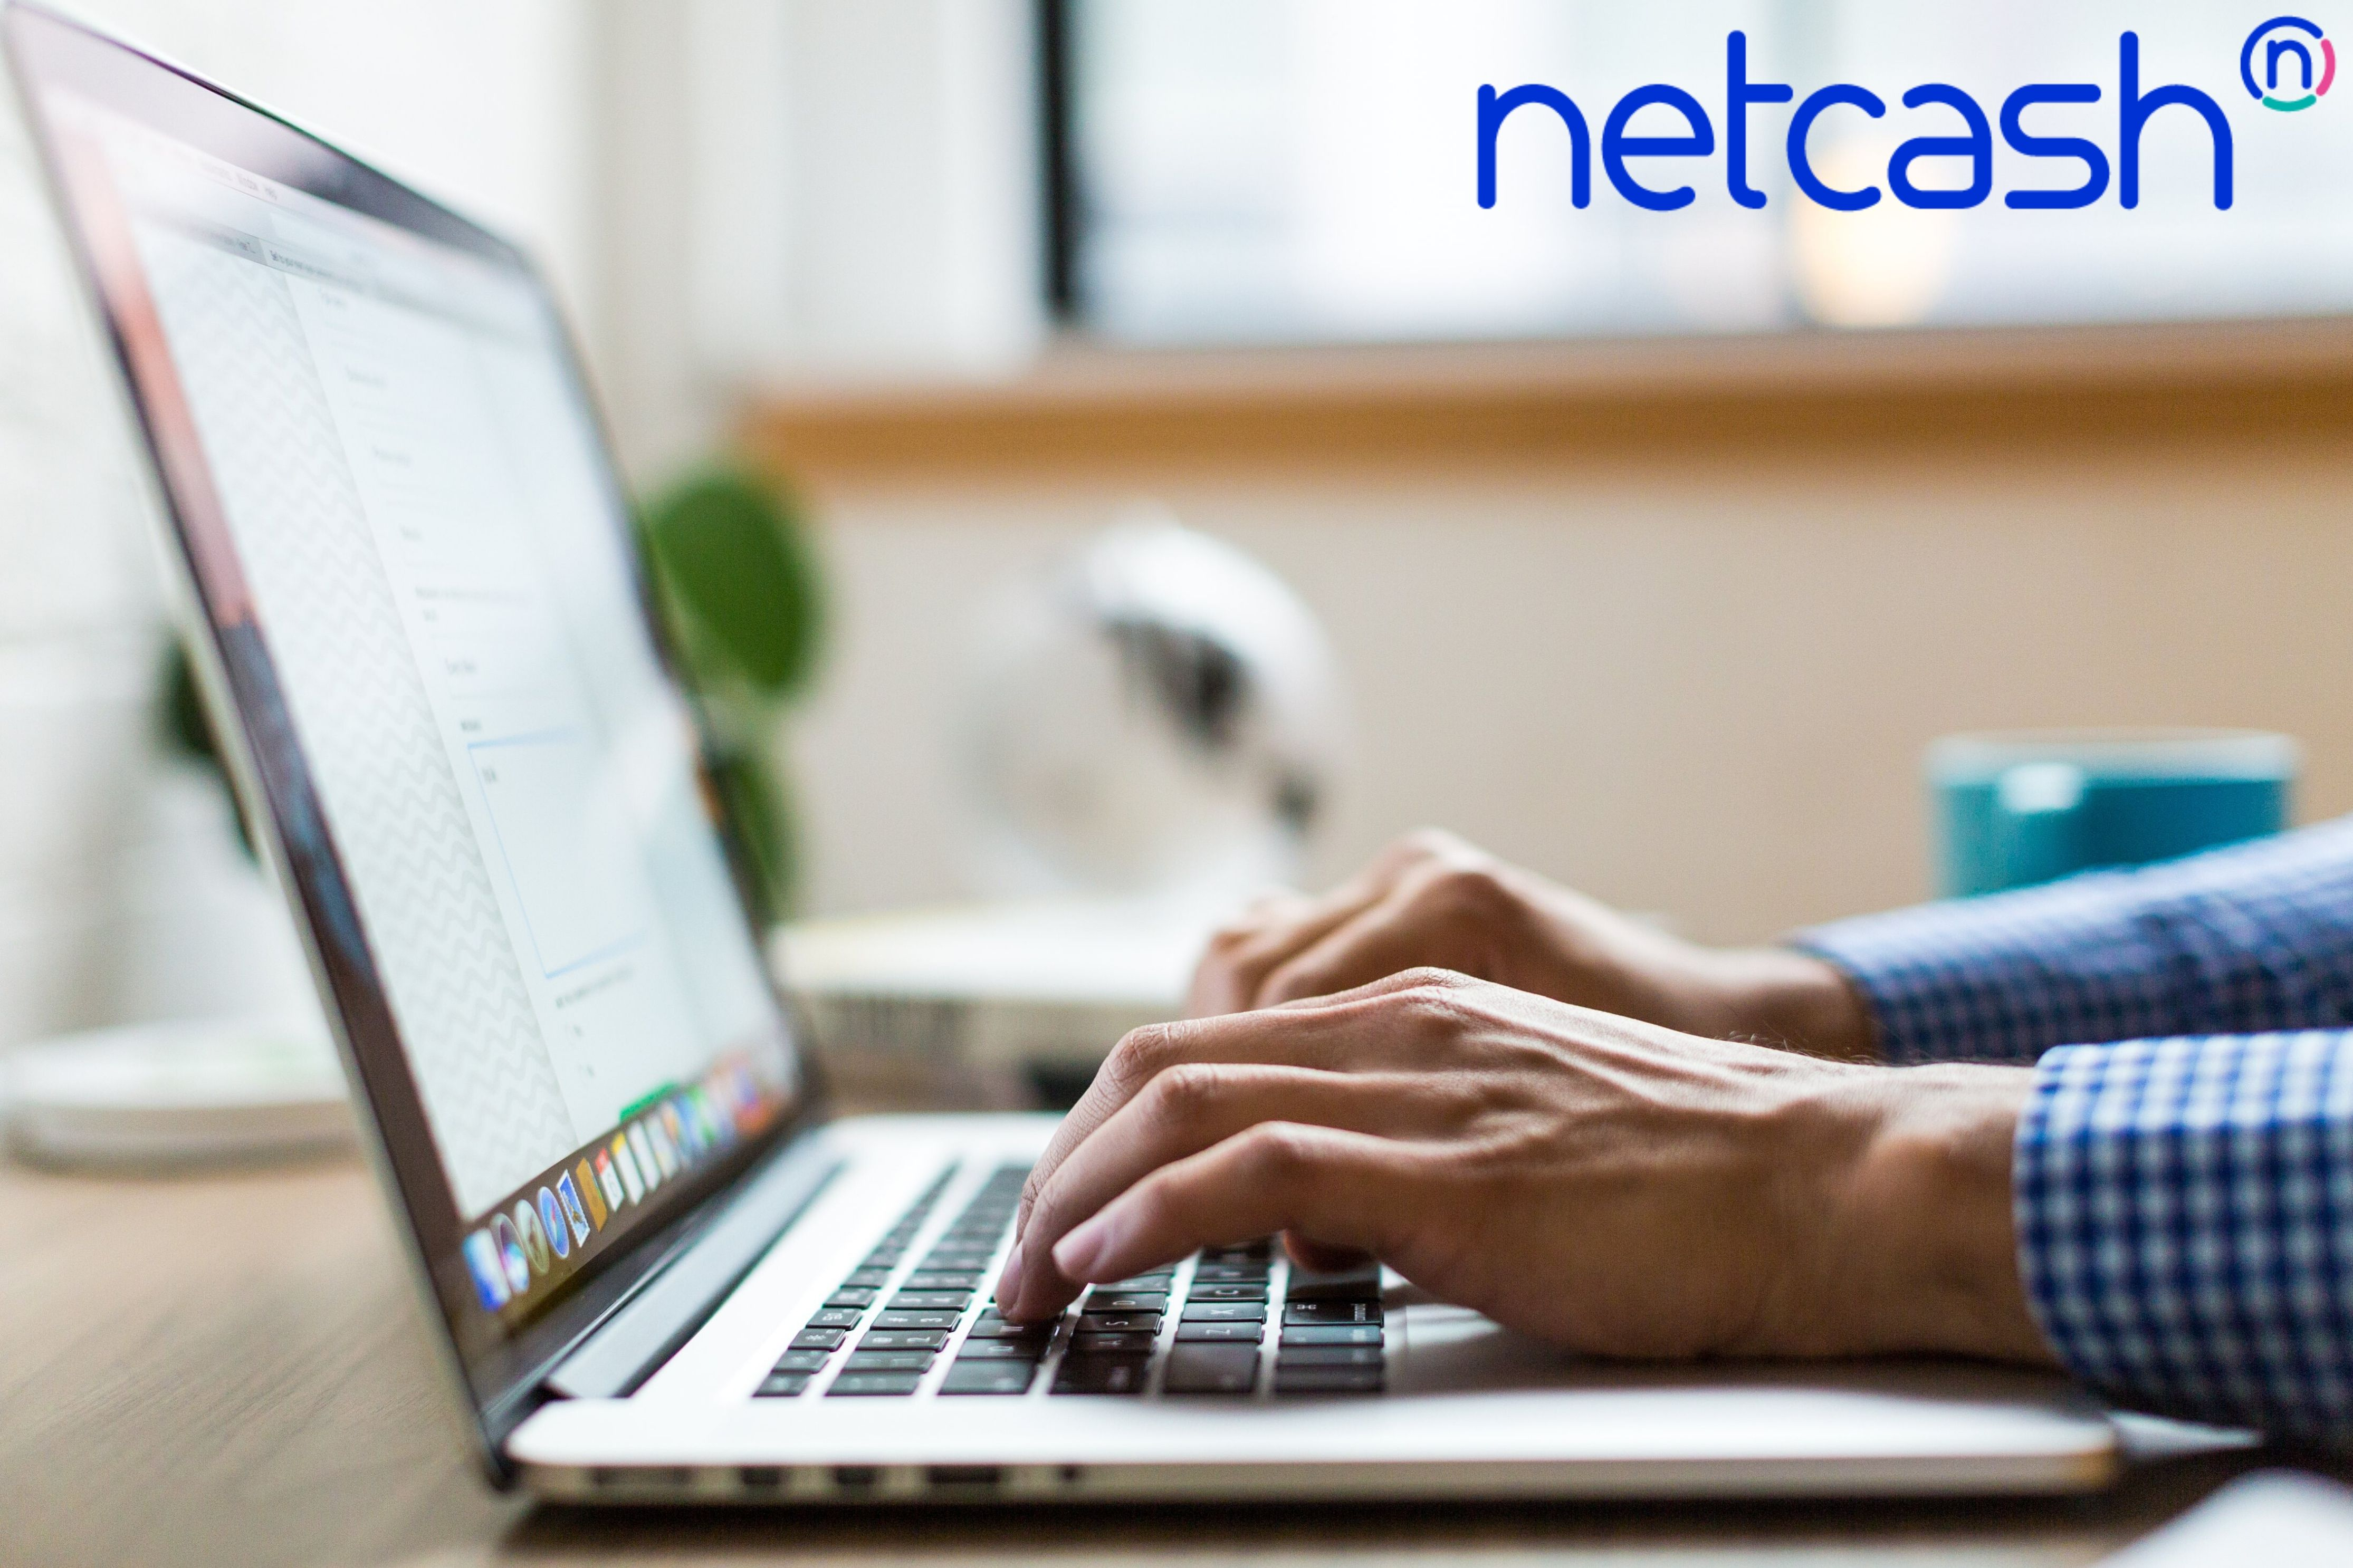 netcash billdozer